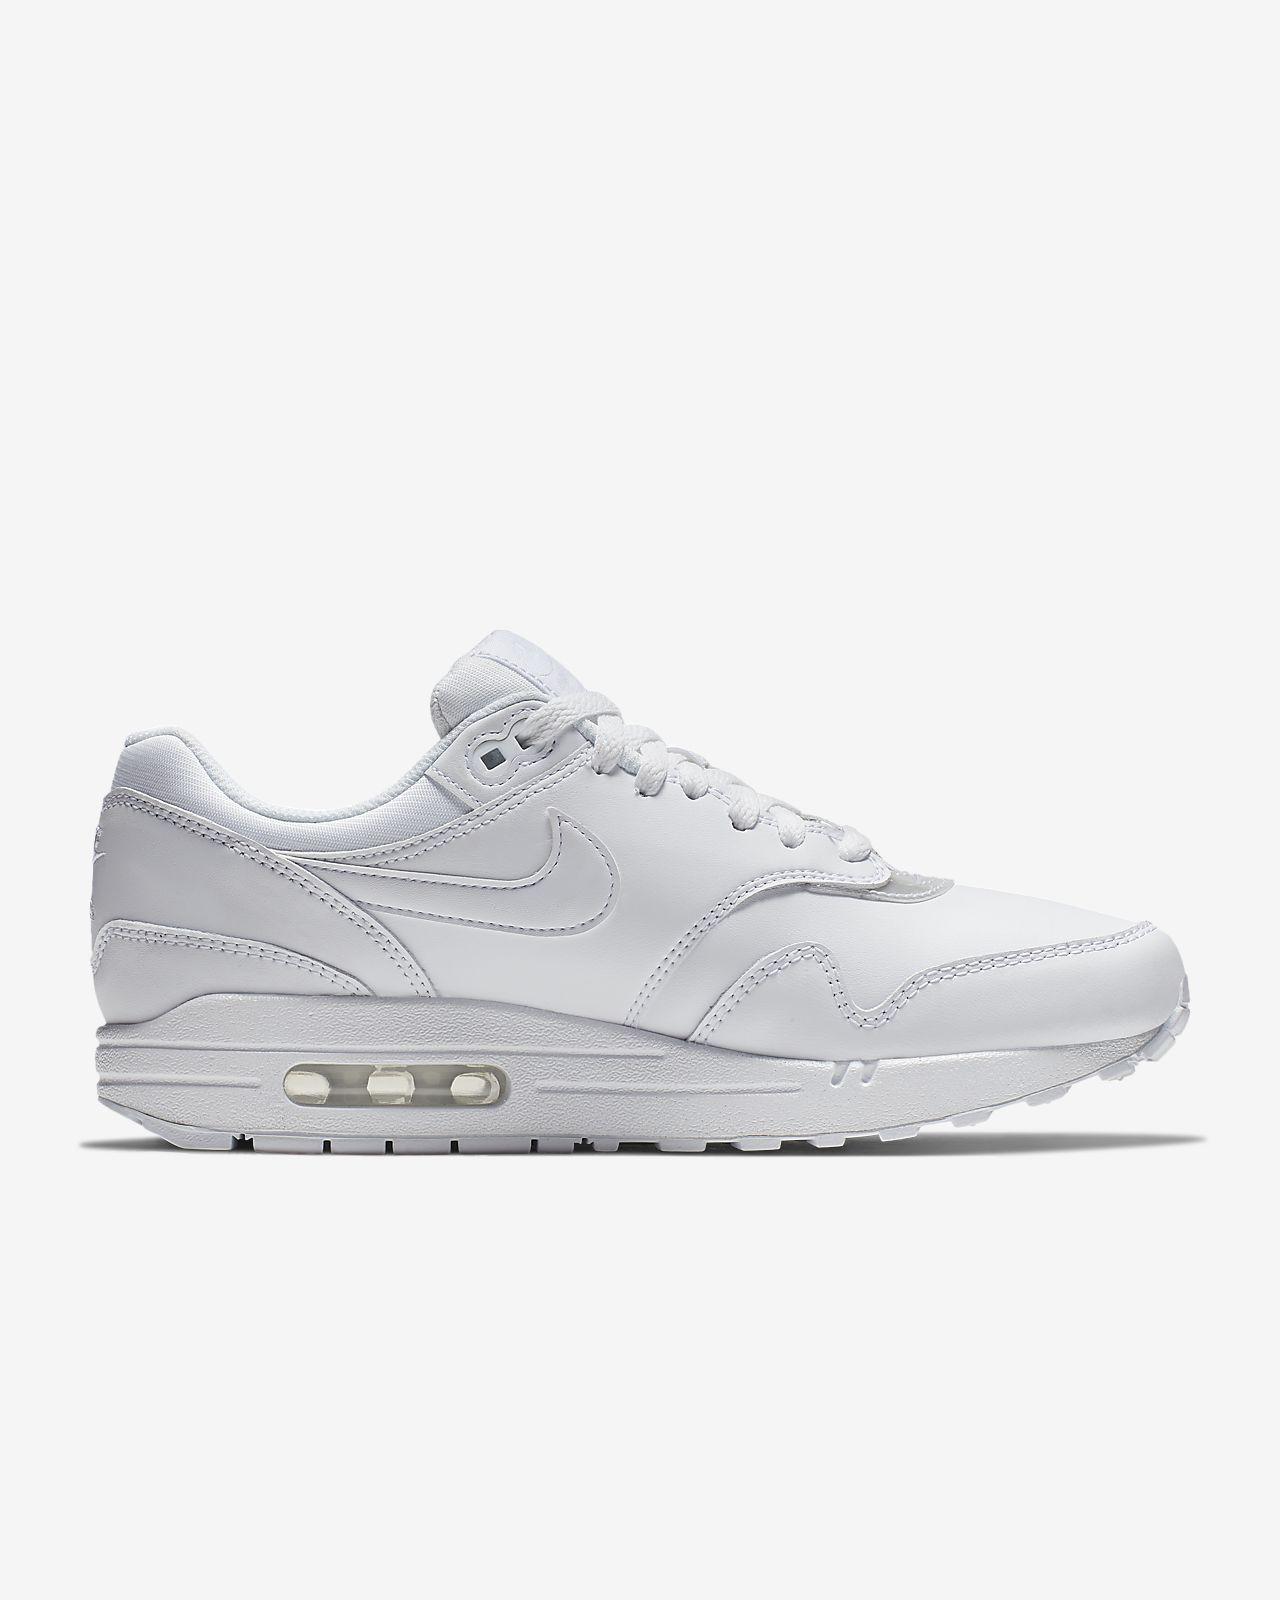 new product edafd dd856 ... Nike Air Max 1 Women s Shoe